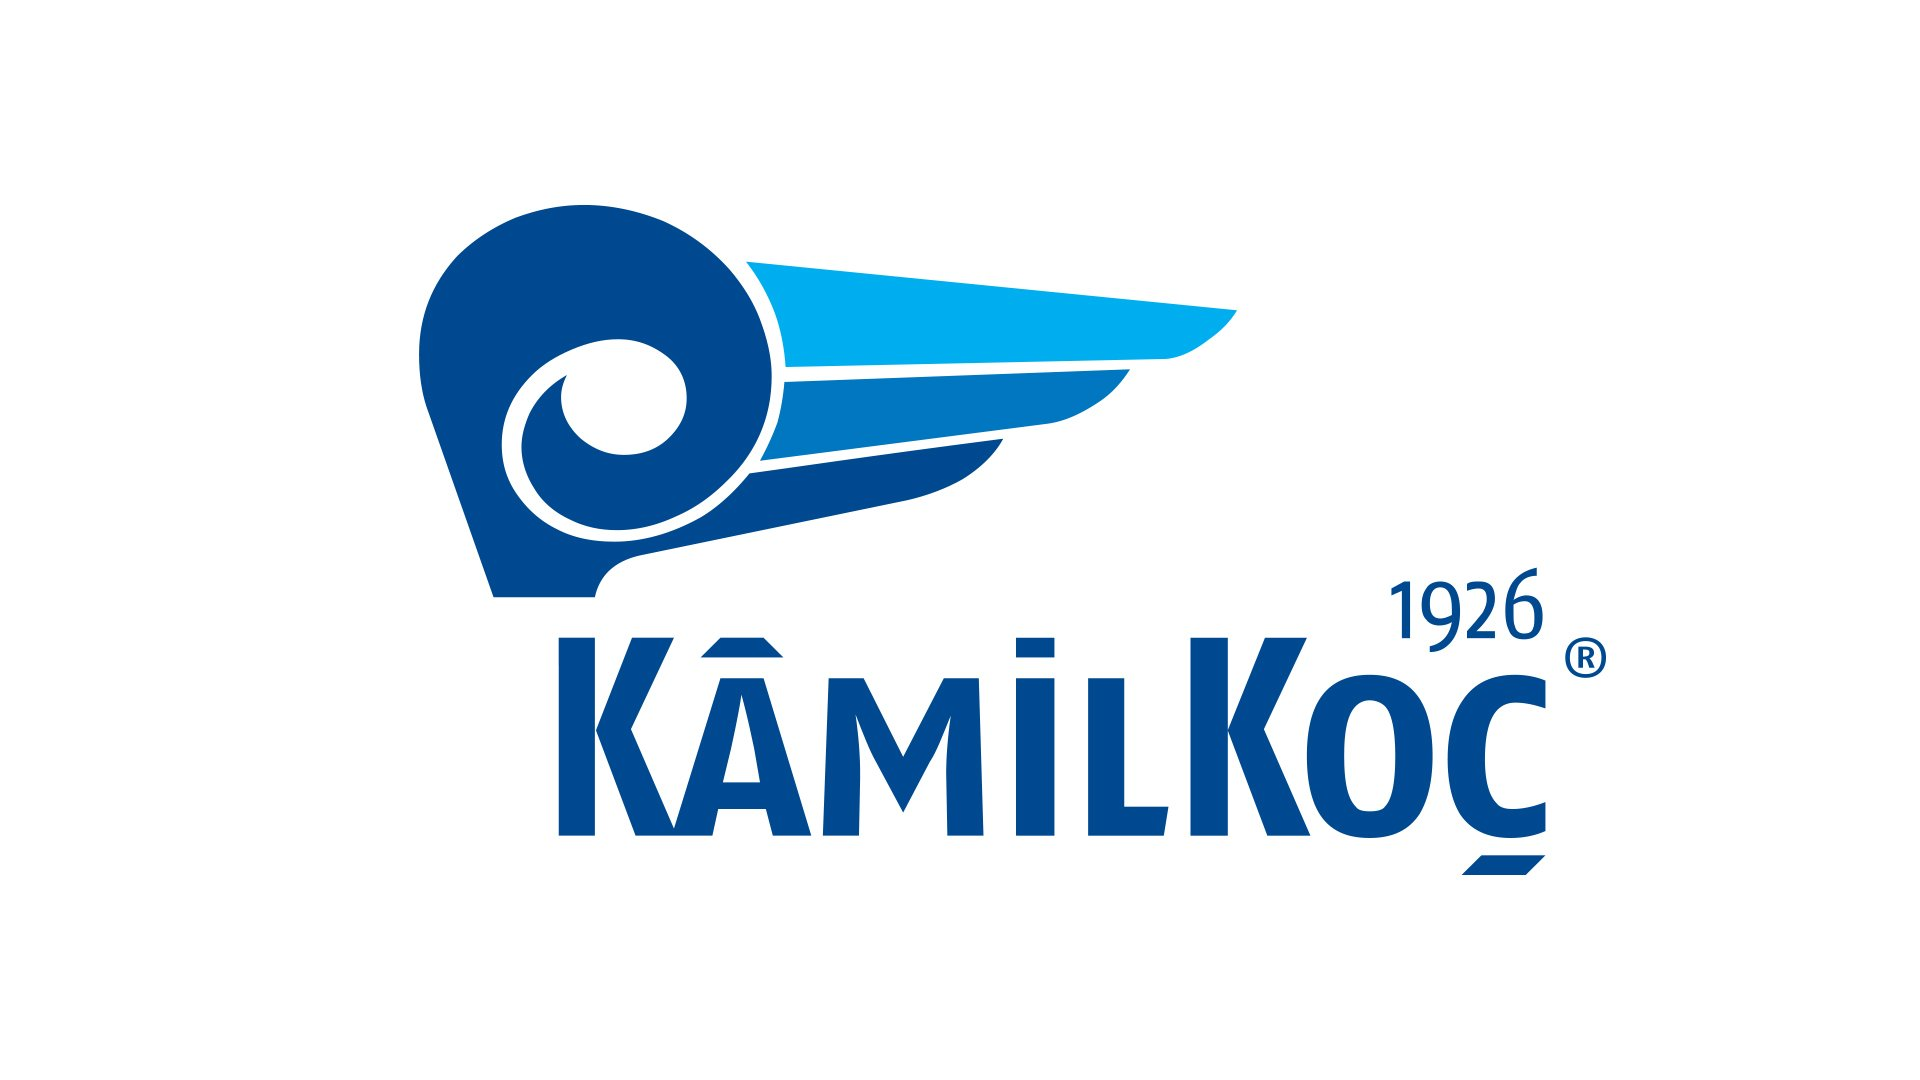 Kmail Koc iletişim